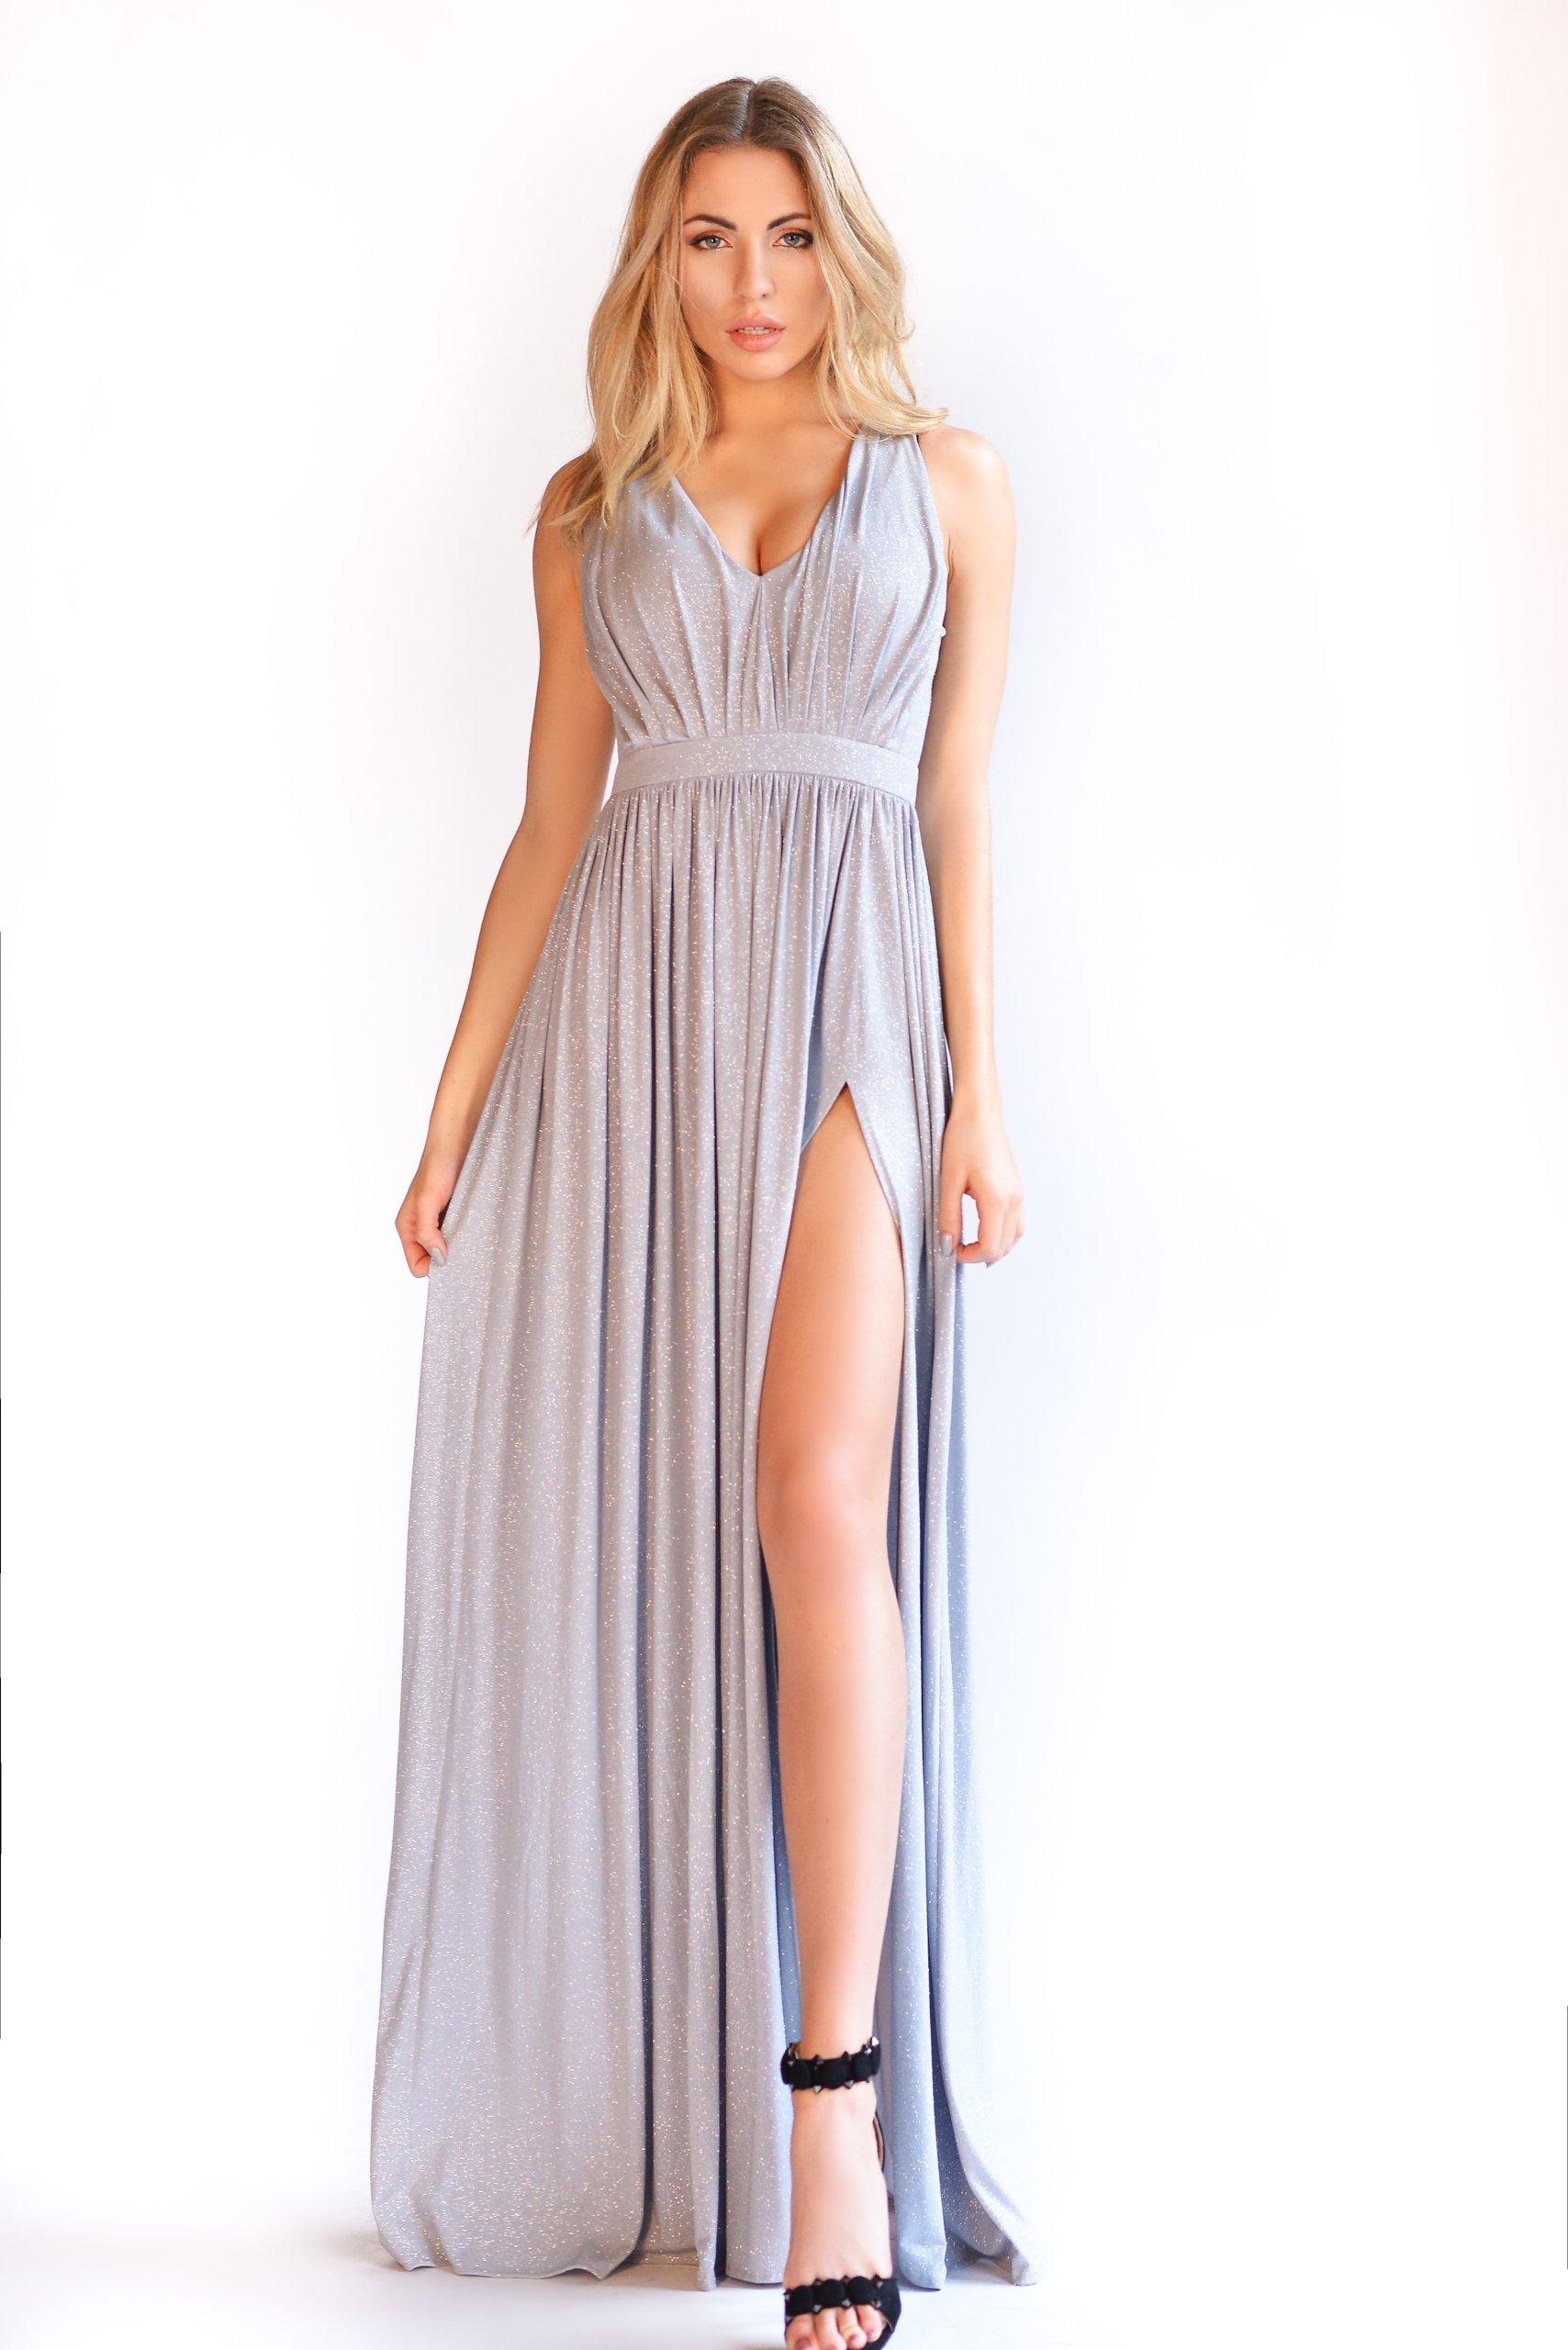 Sukienka Maxi Brokat Szara Wesele Vestito S 7024184492 Oficjalne